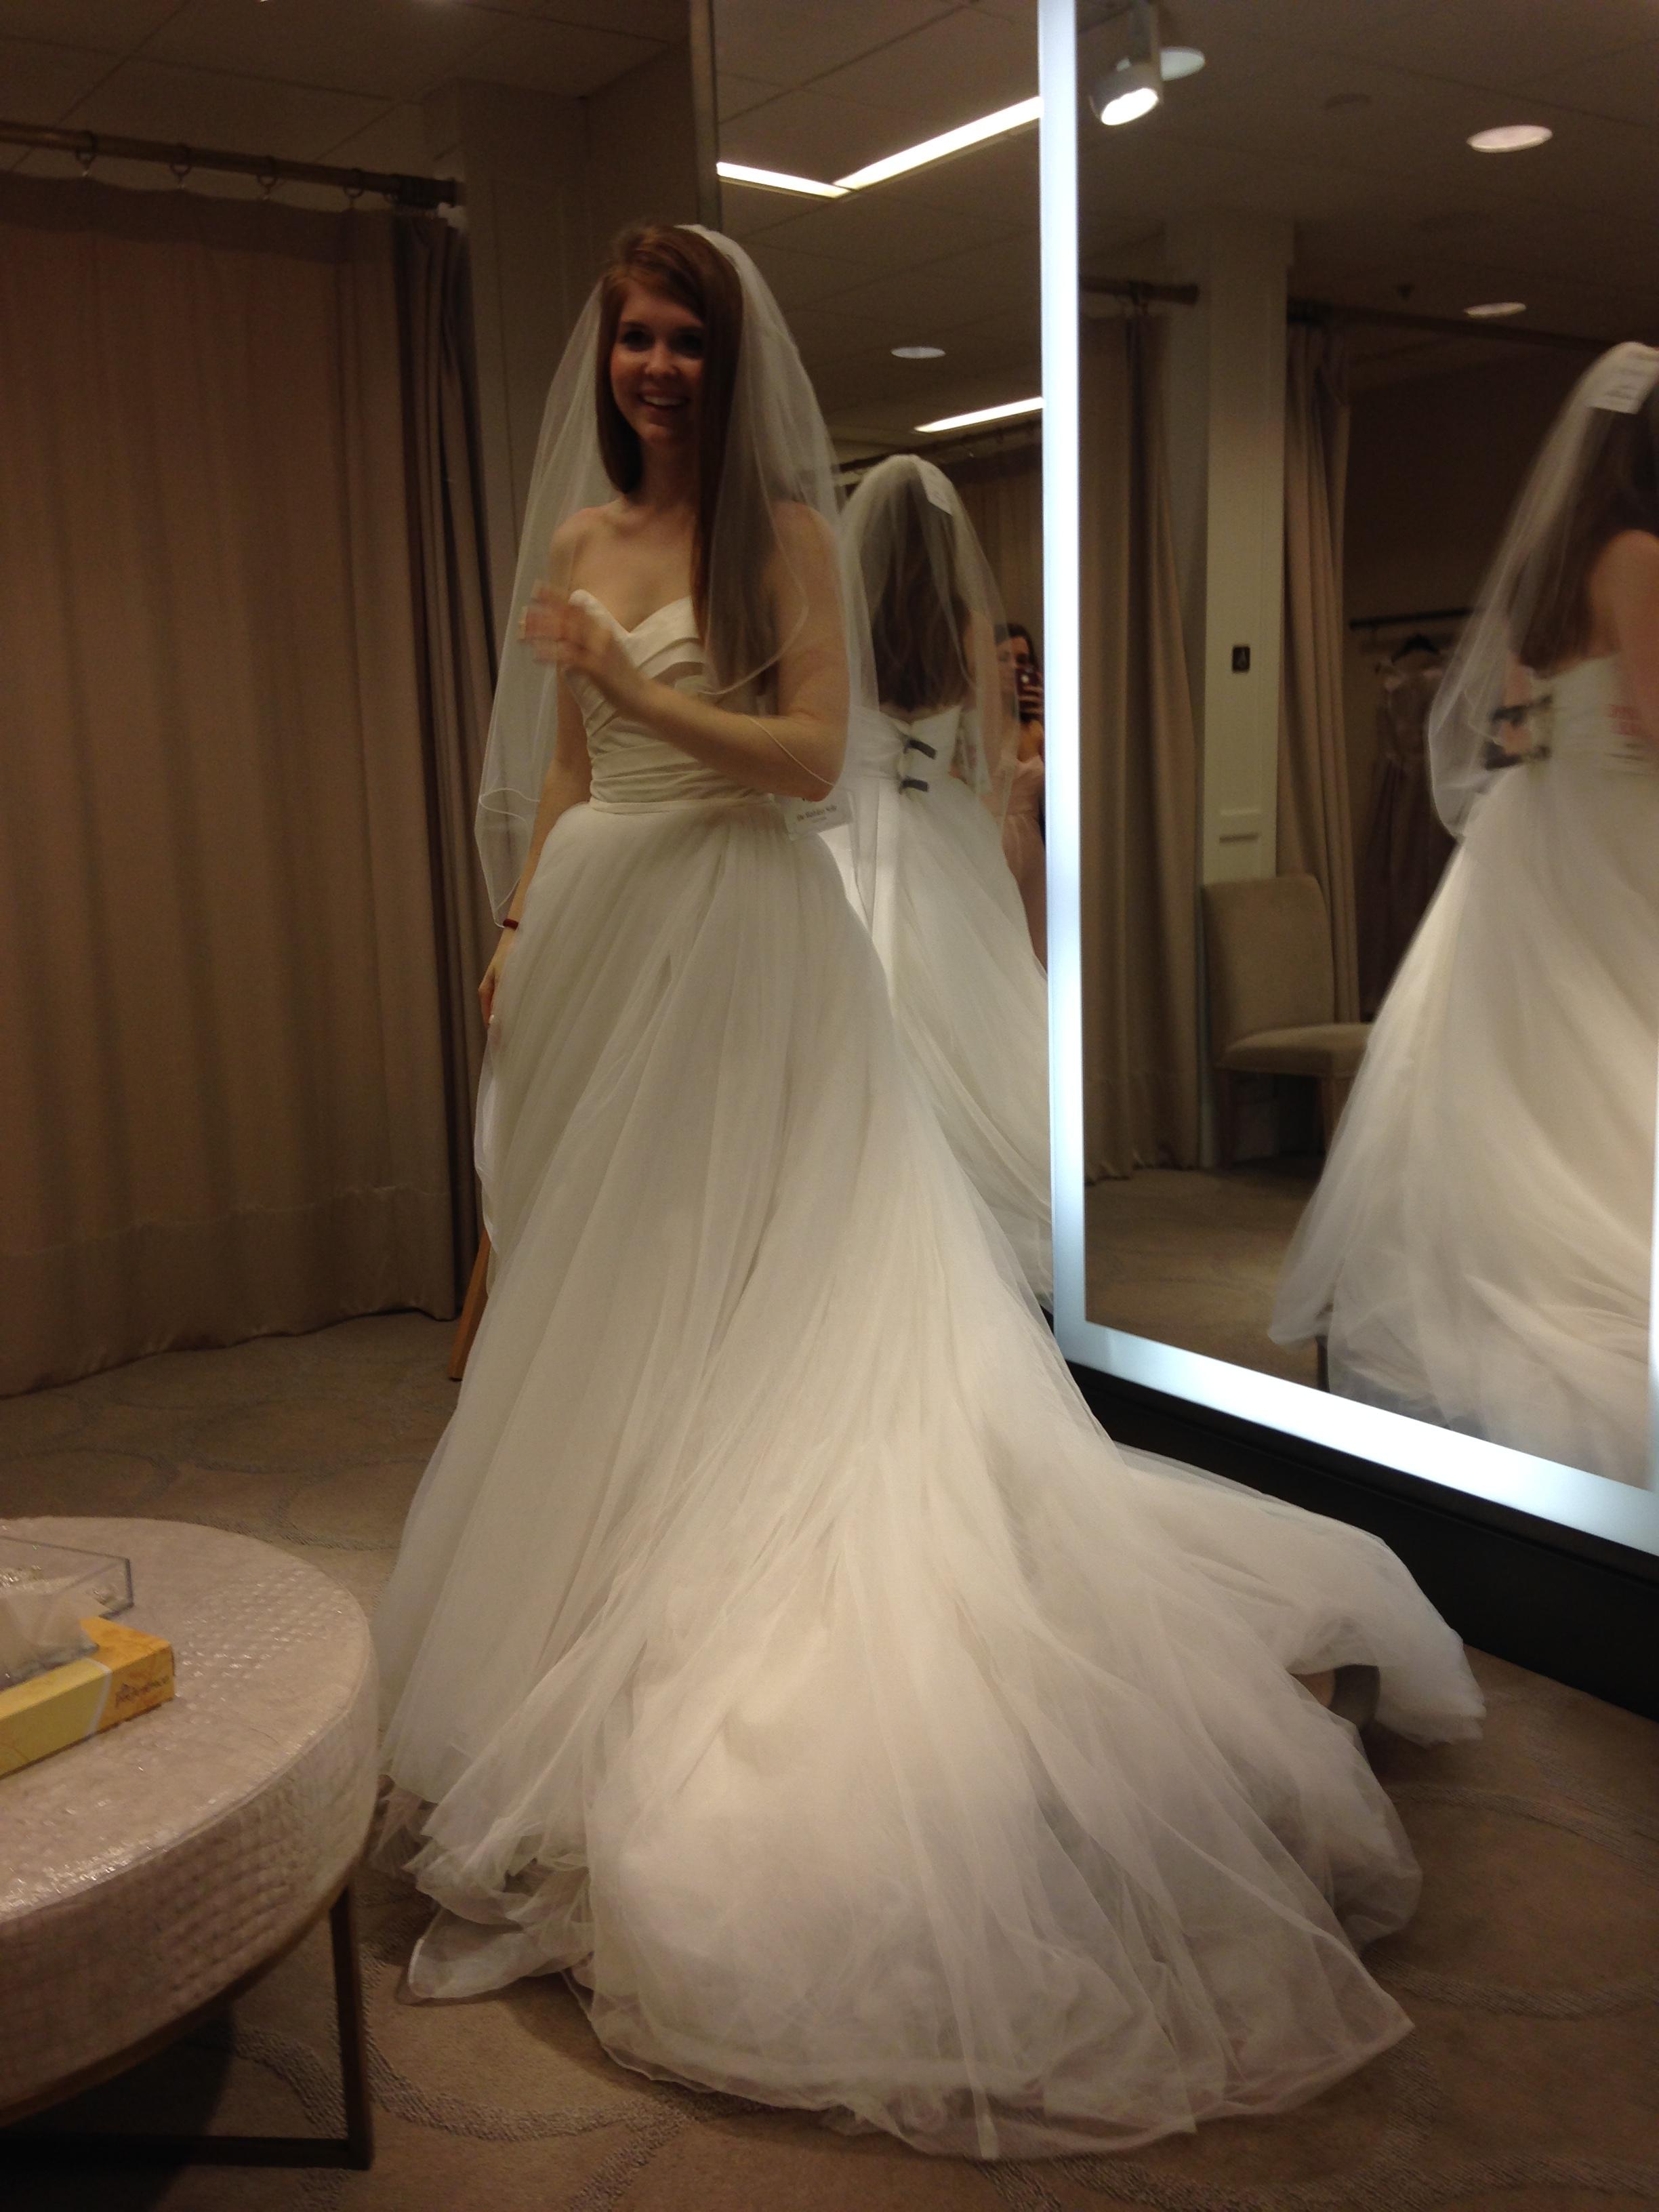 nordstroms wedding dresses wedding dresses nordstrom how i found my wedding dress plus 9 tips to find yours wedding dress